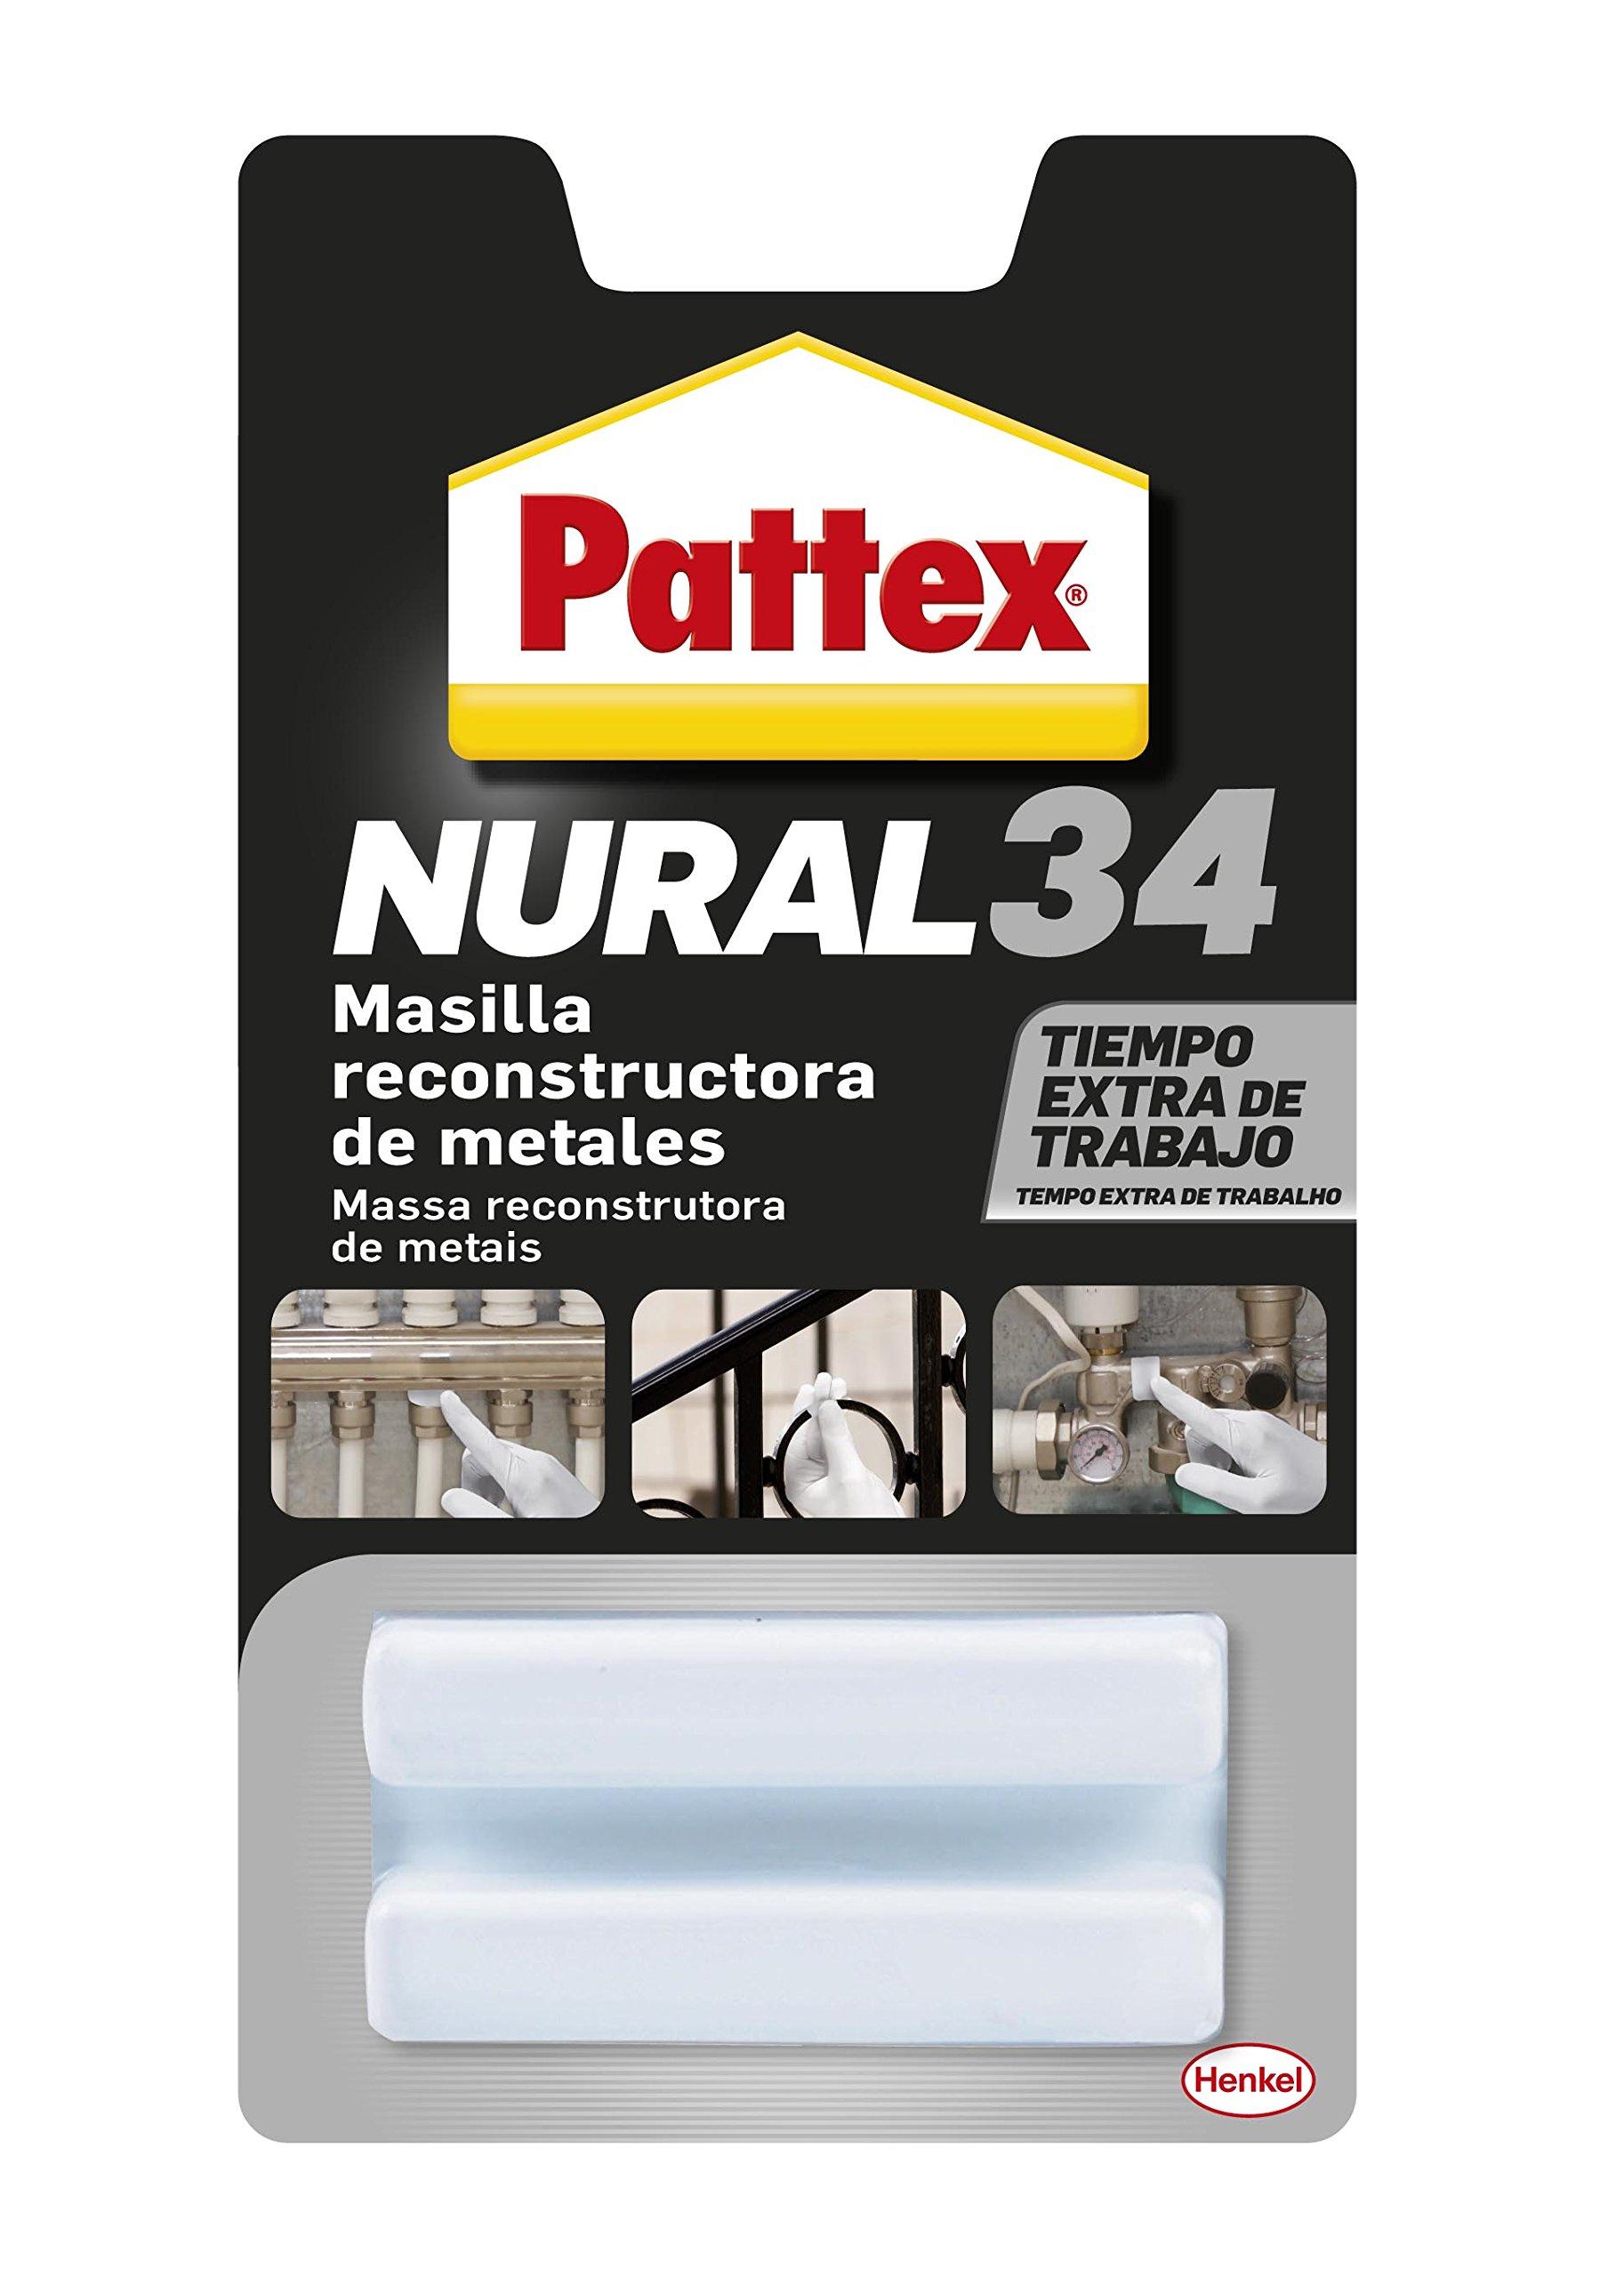 Pattex Nural 34, masilla reconstructora de metales, color gris, 50gr product image